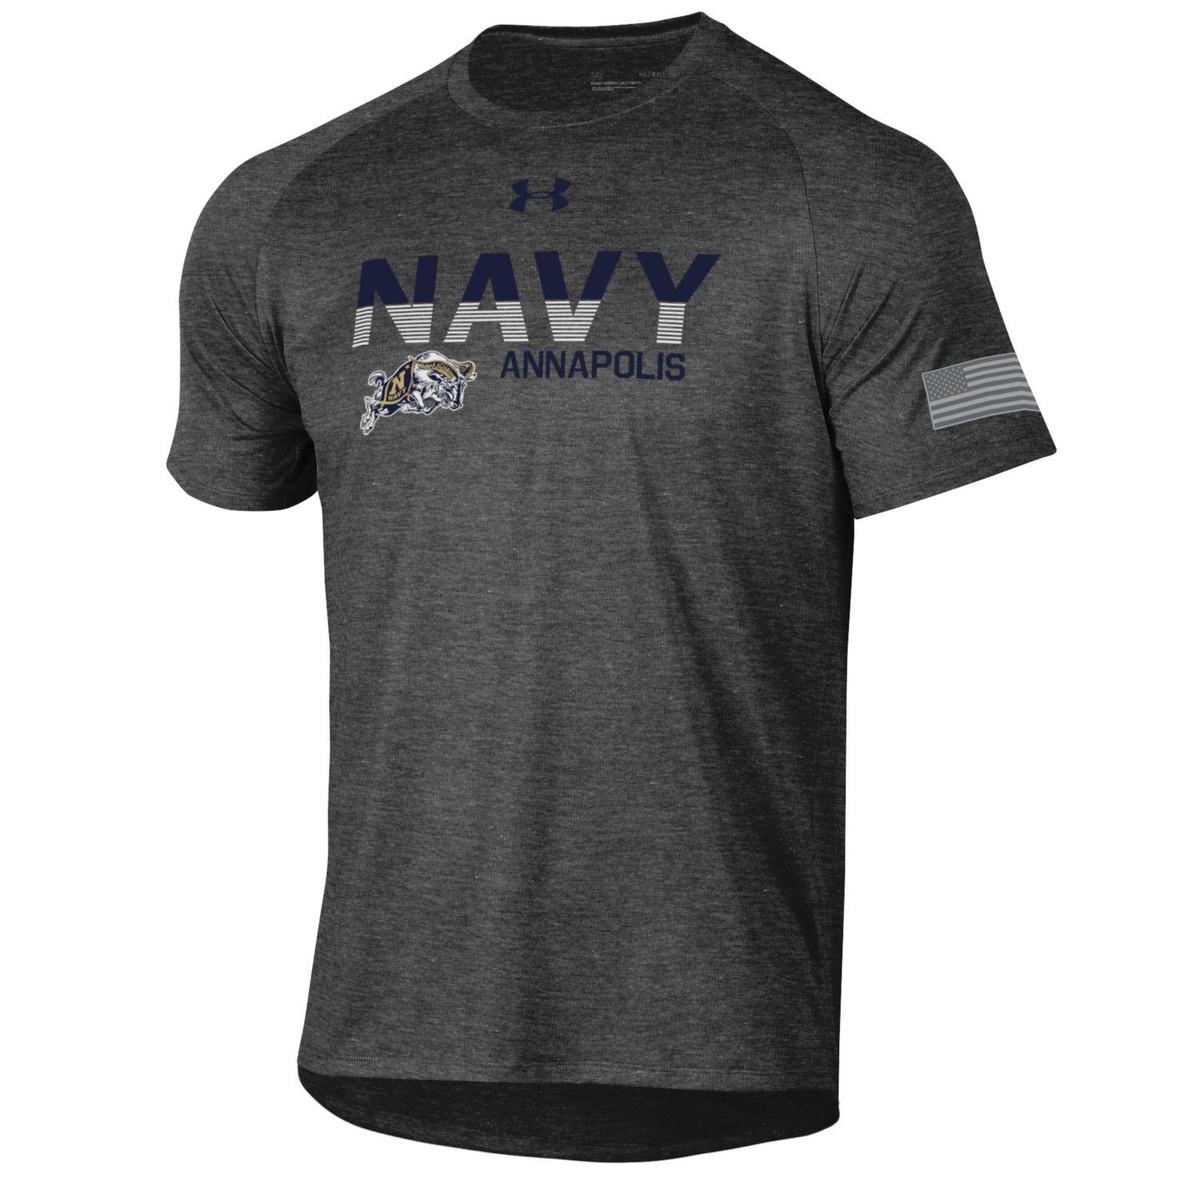 Navy Goat tee